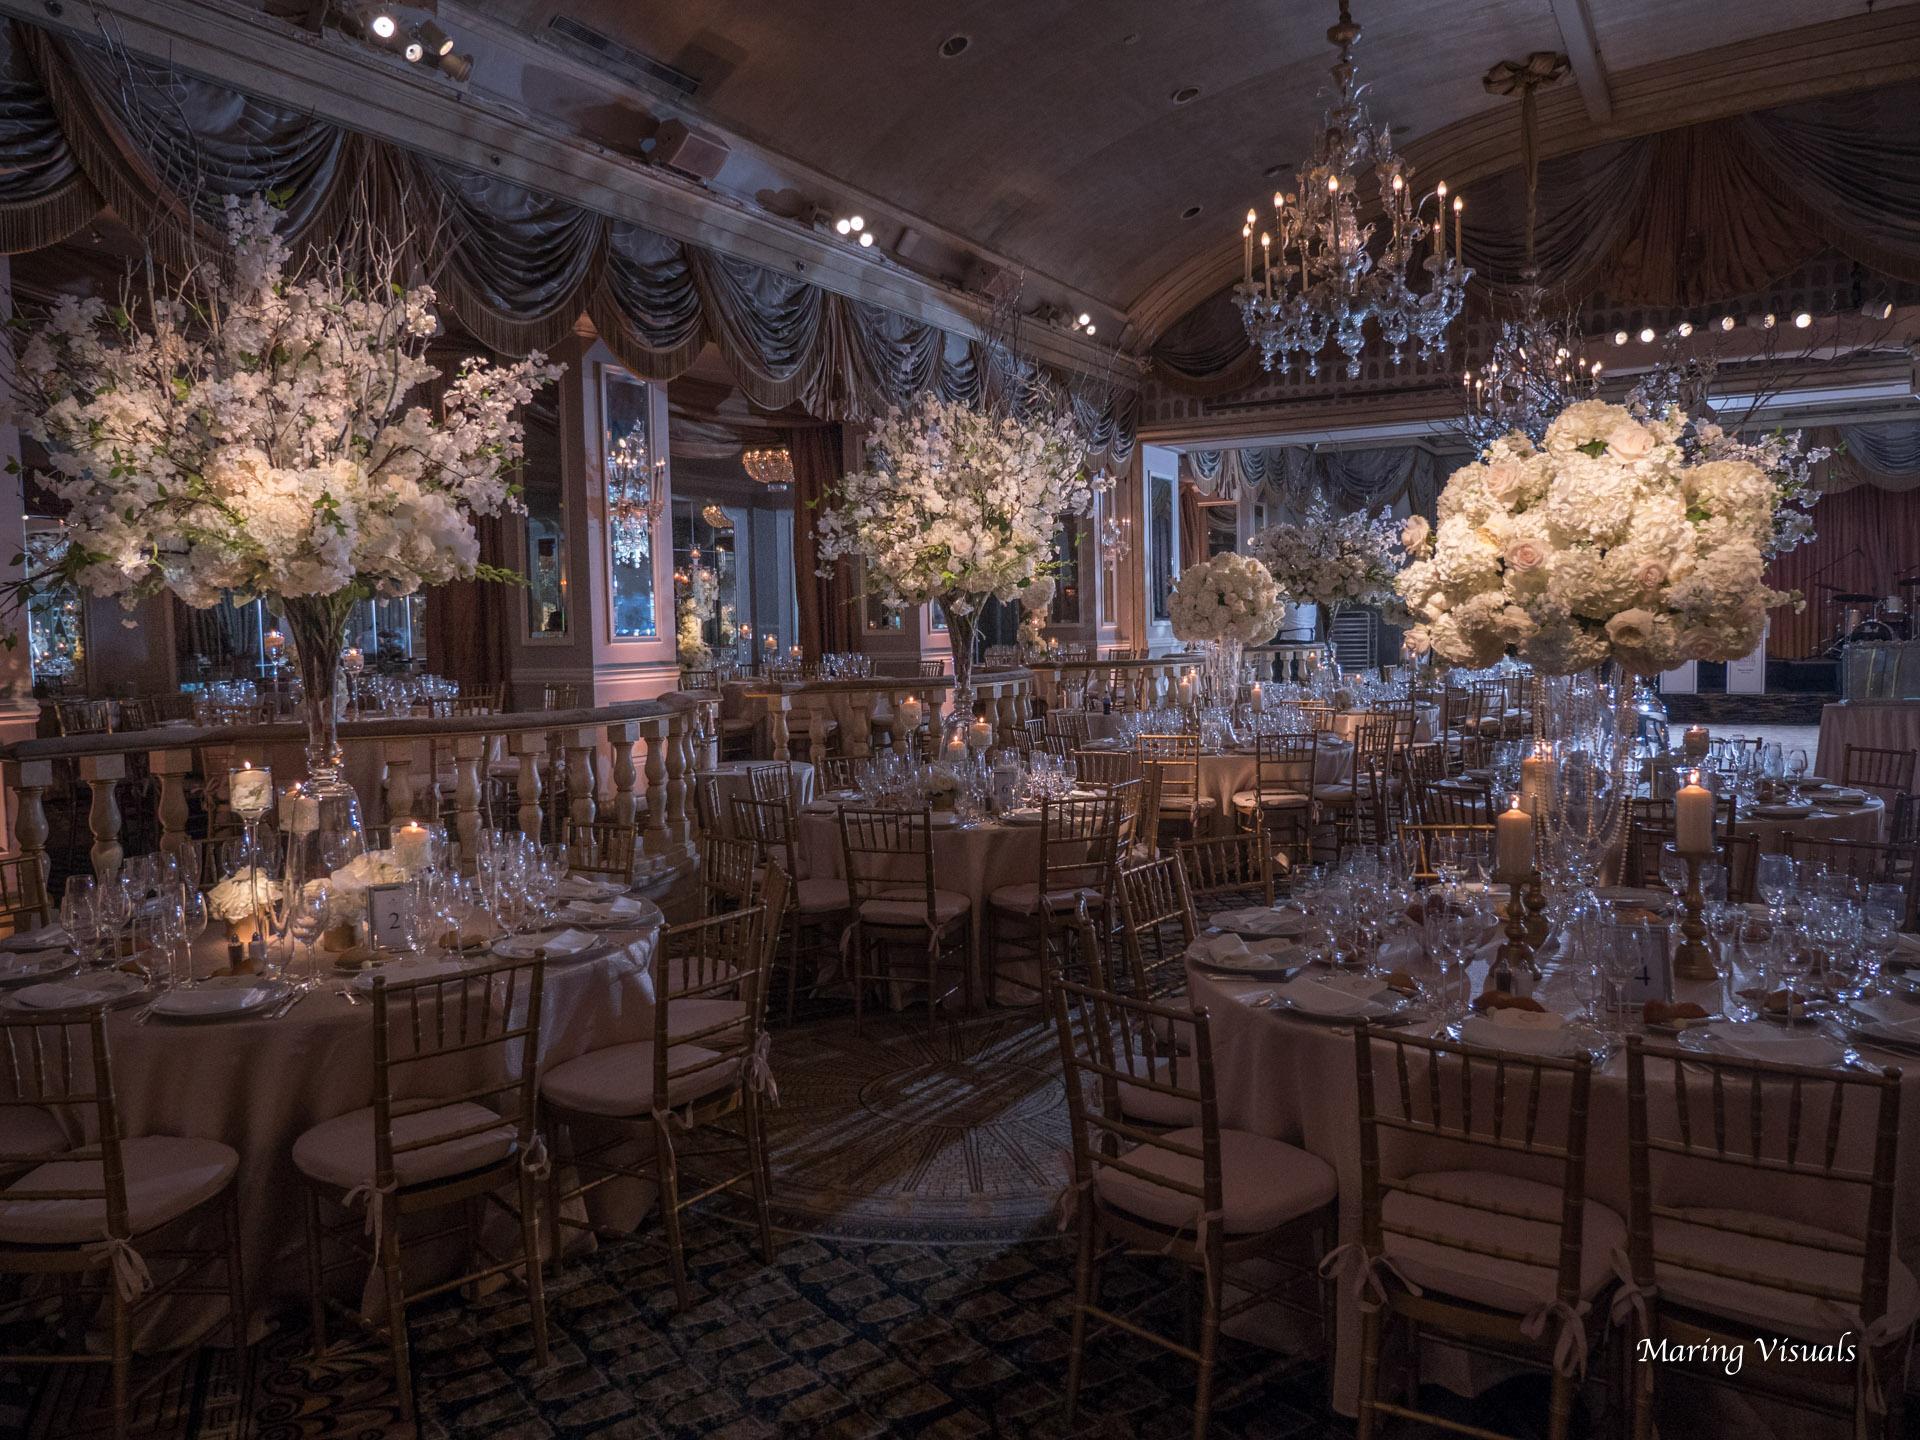 The Pierre Hotel Ballroom